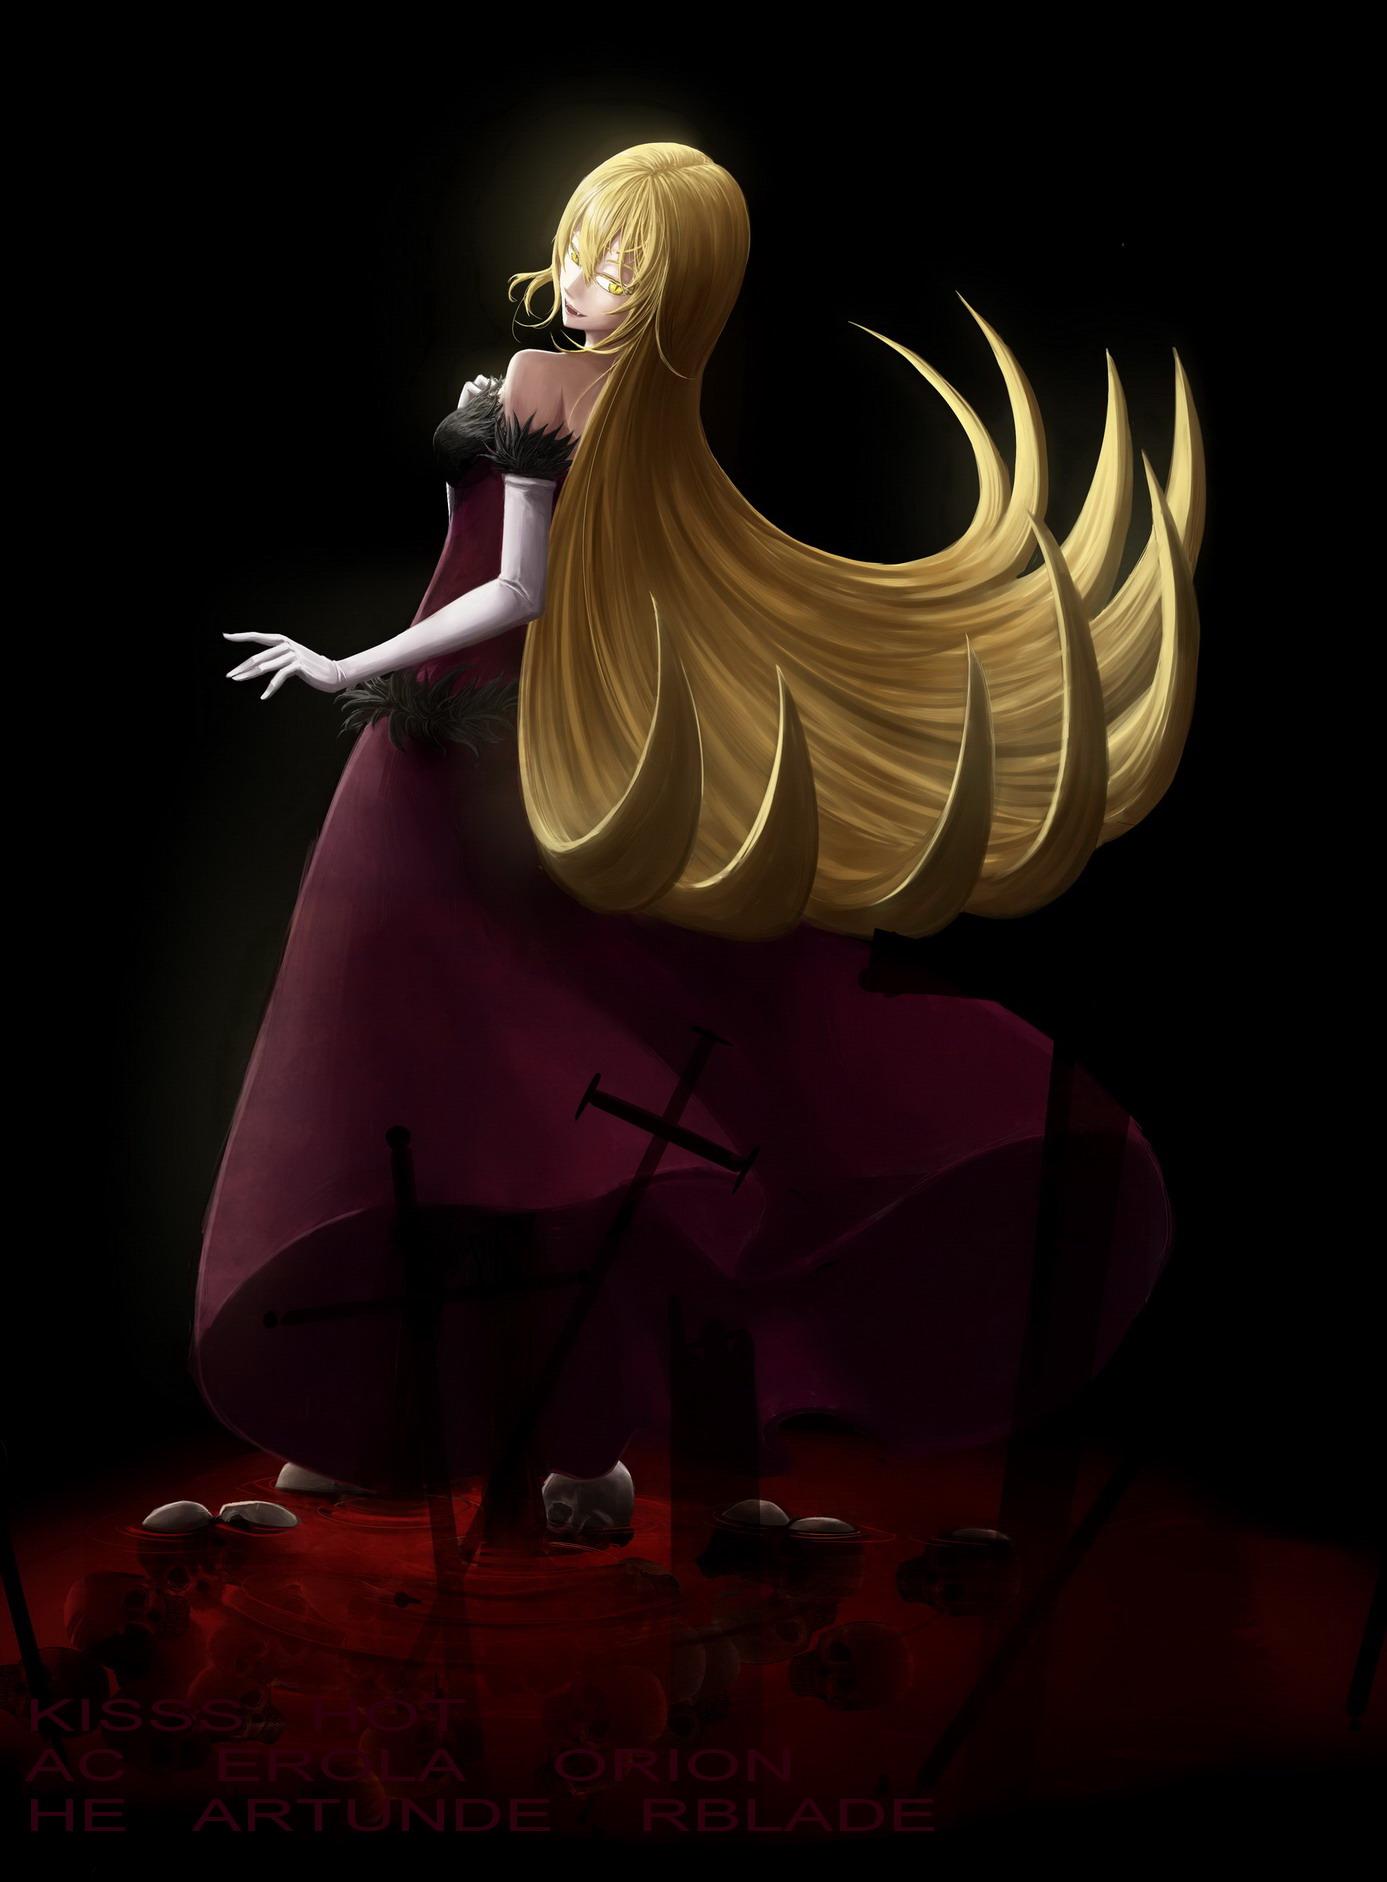 ... Anime, Darkers, Monogatari, Kiss-shot Acerola-orion Heart-under-blade